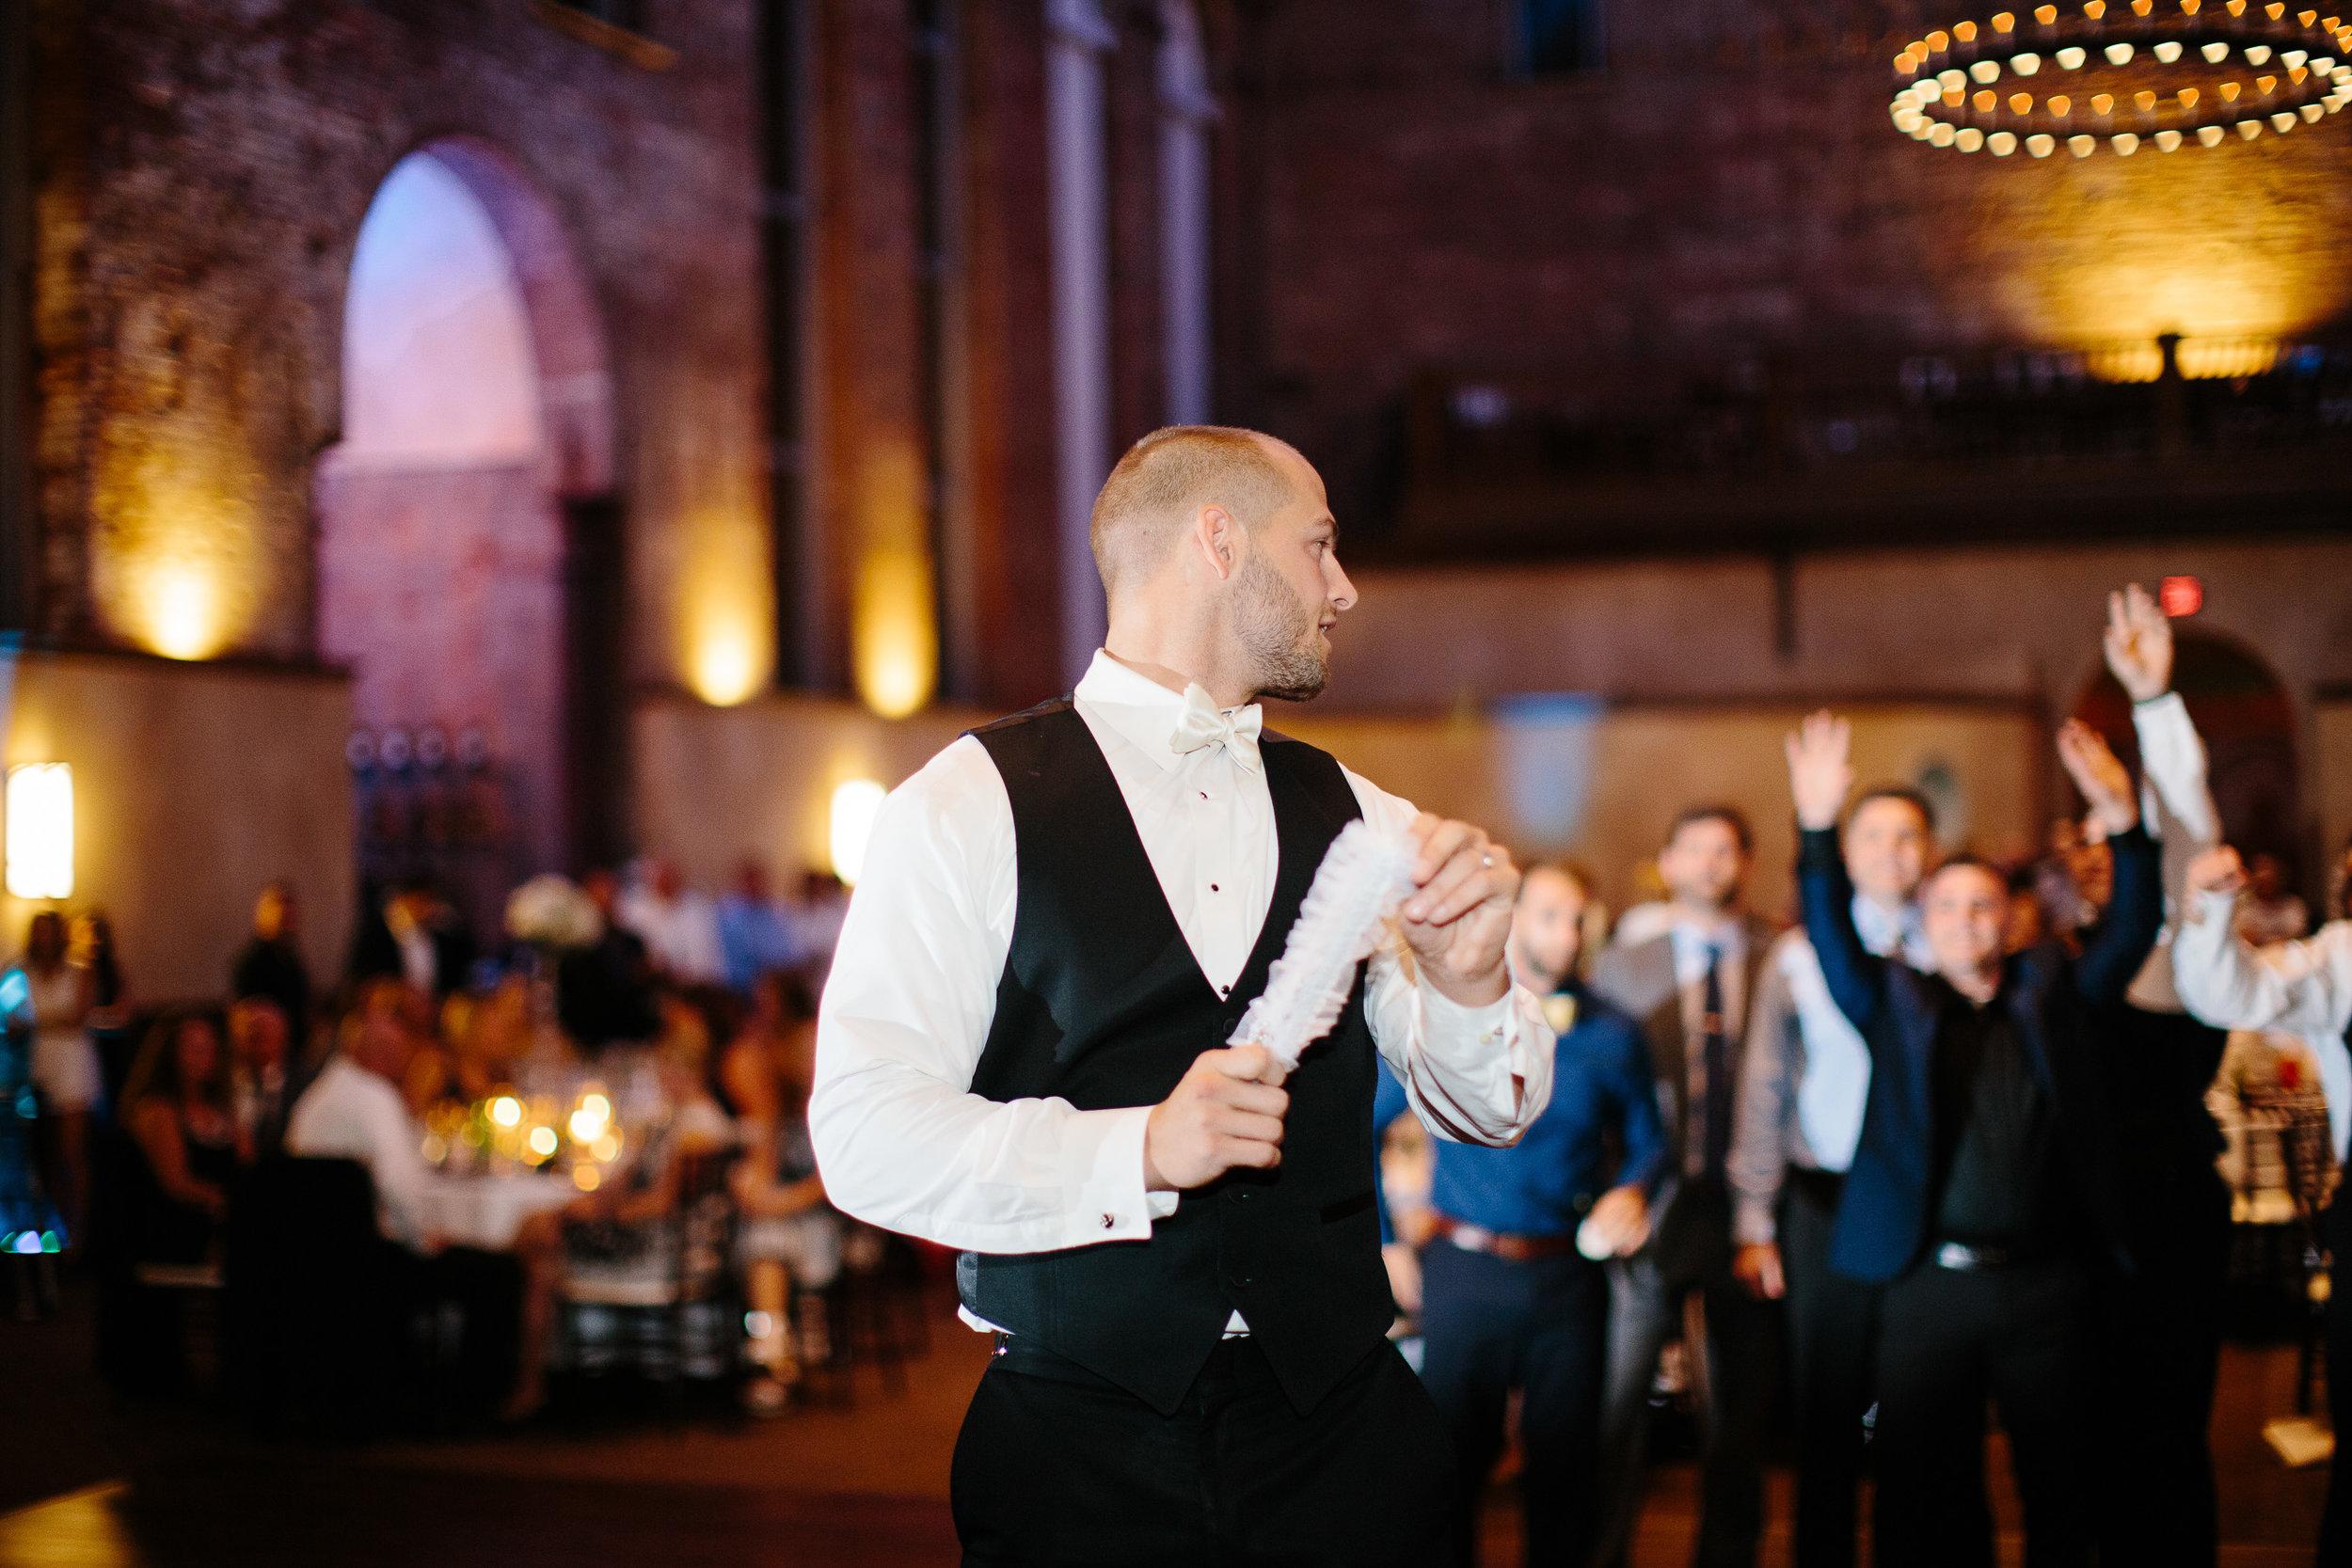 0691_20170819 Randi and Chance Wedding.jpg